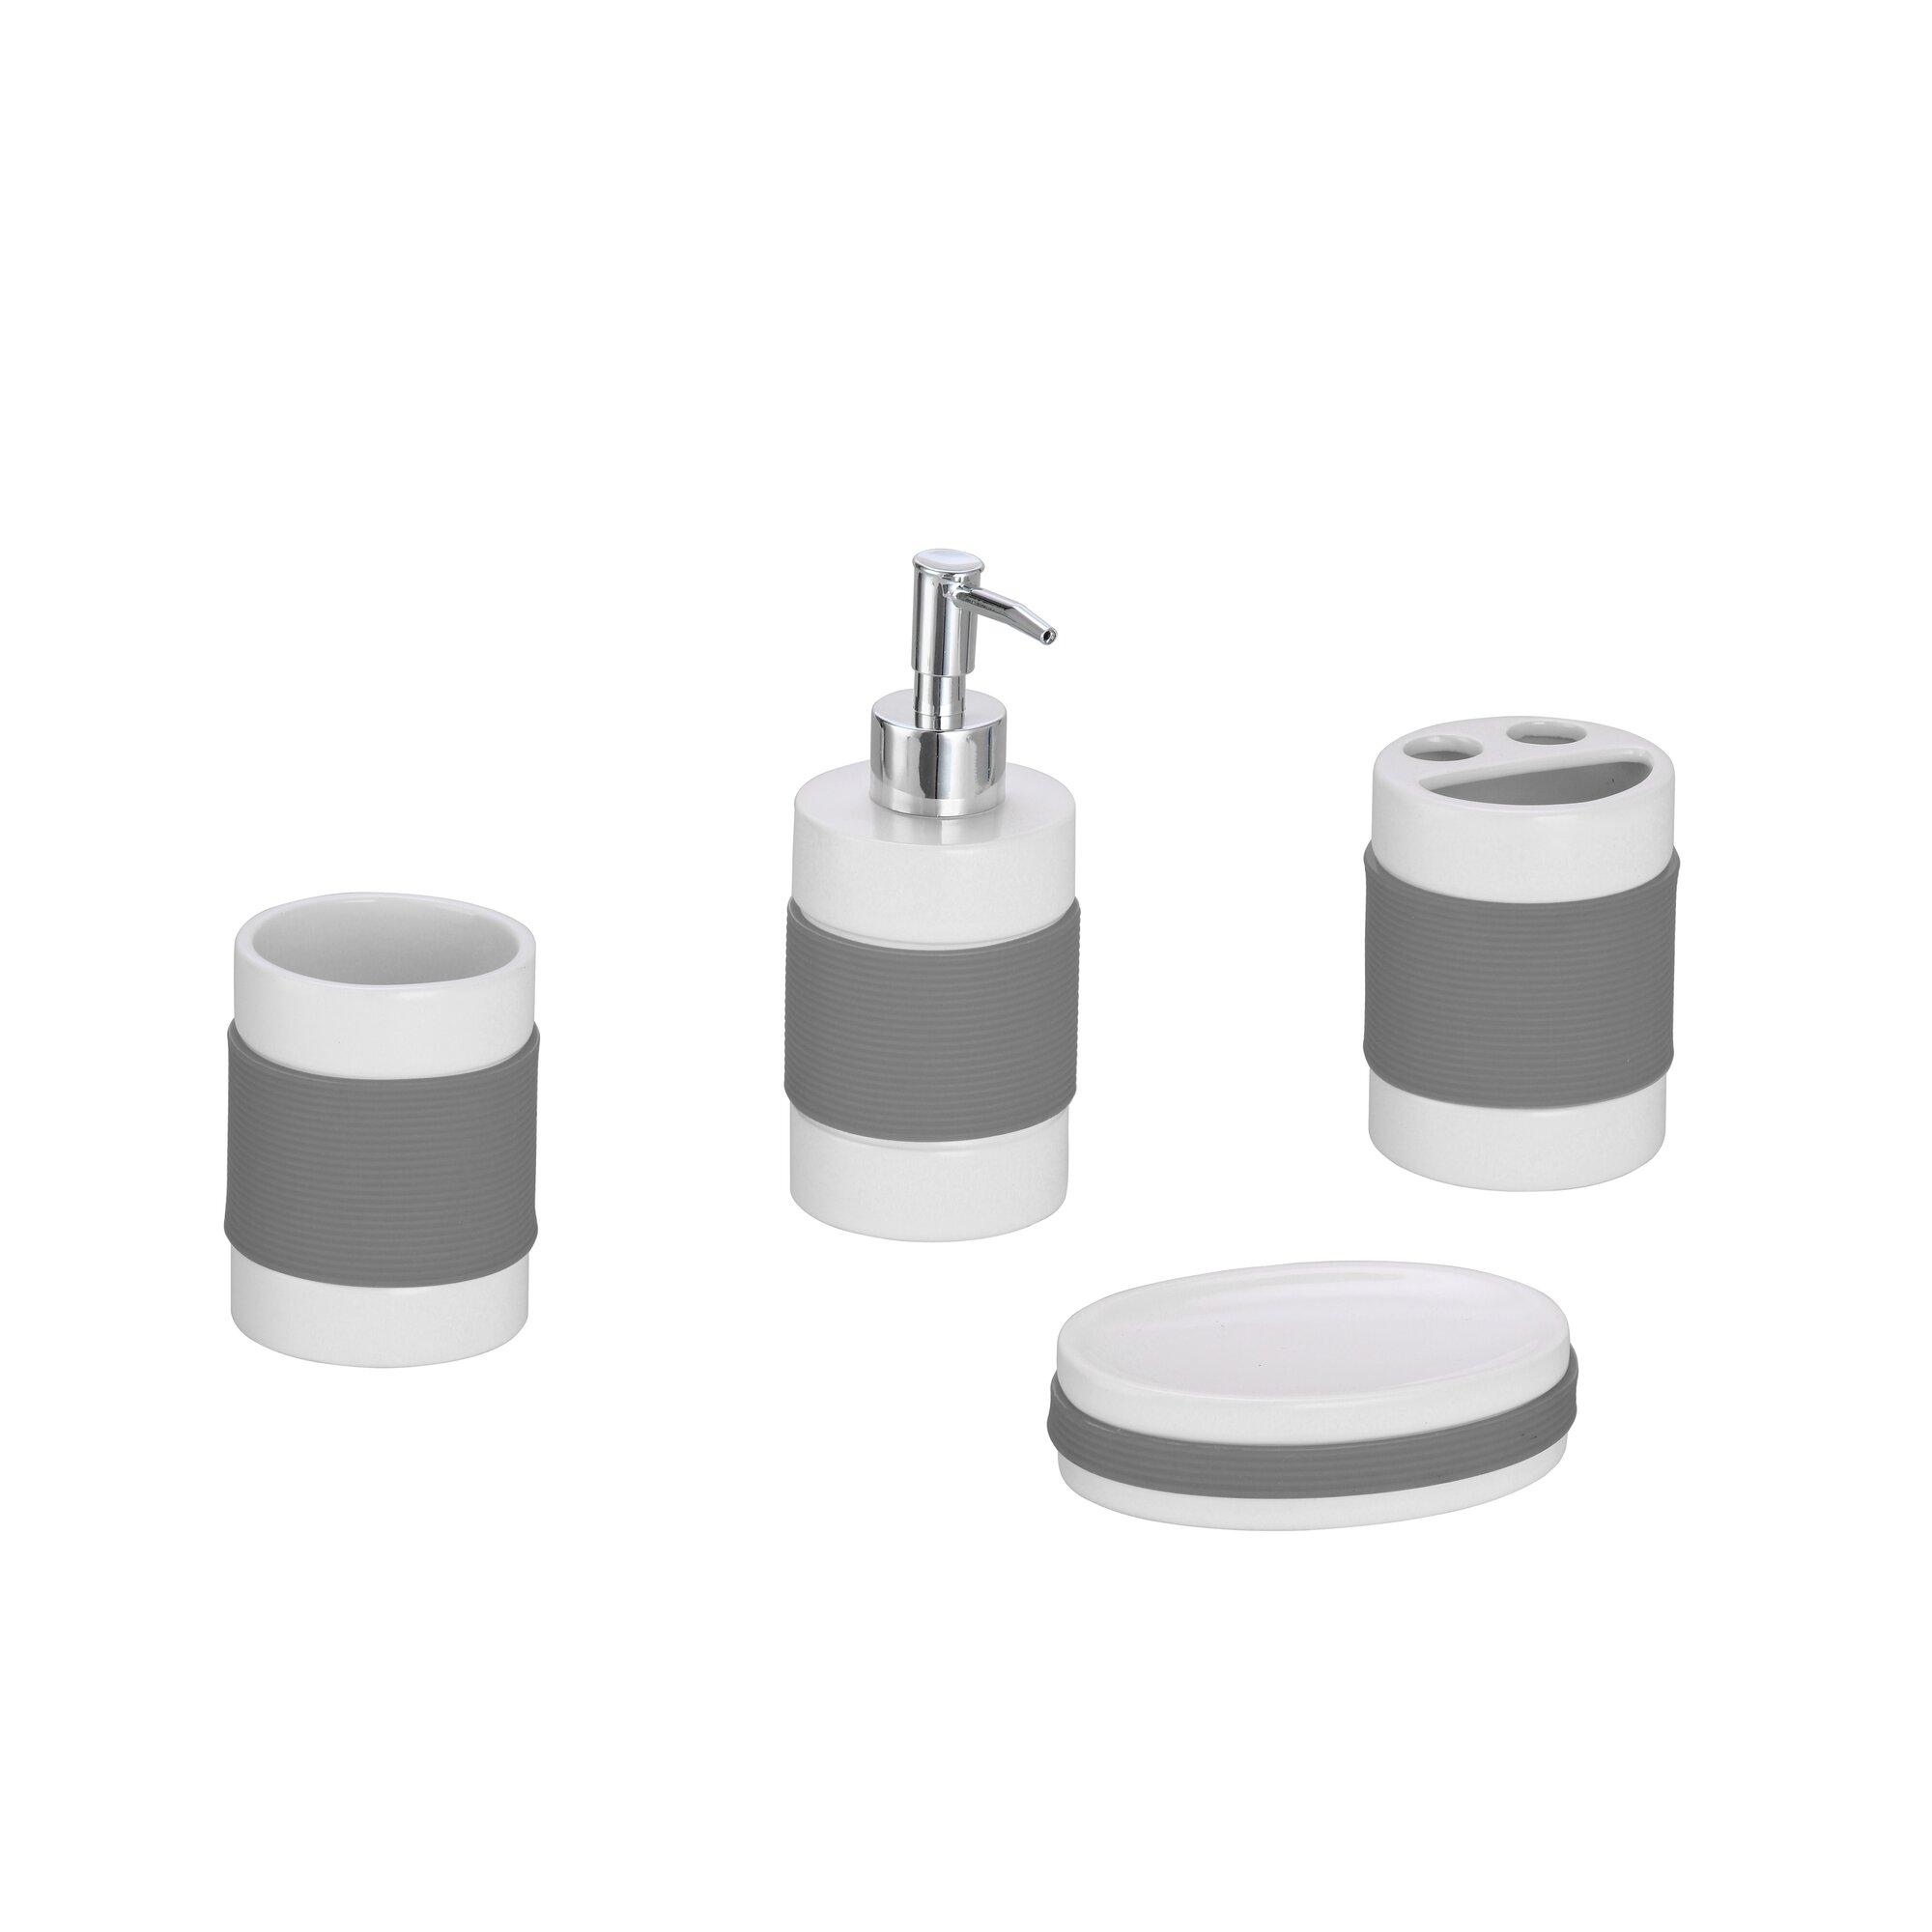 4 Piece Bathroom Accessory Set The Twillery Co Hardy 4 Piece Bathroom Accessory Set Reviews